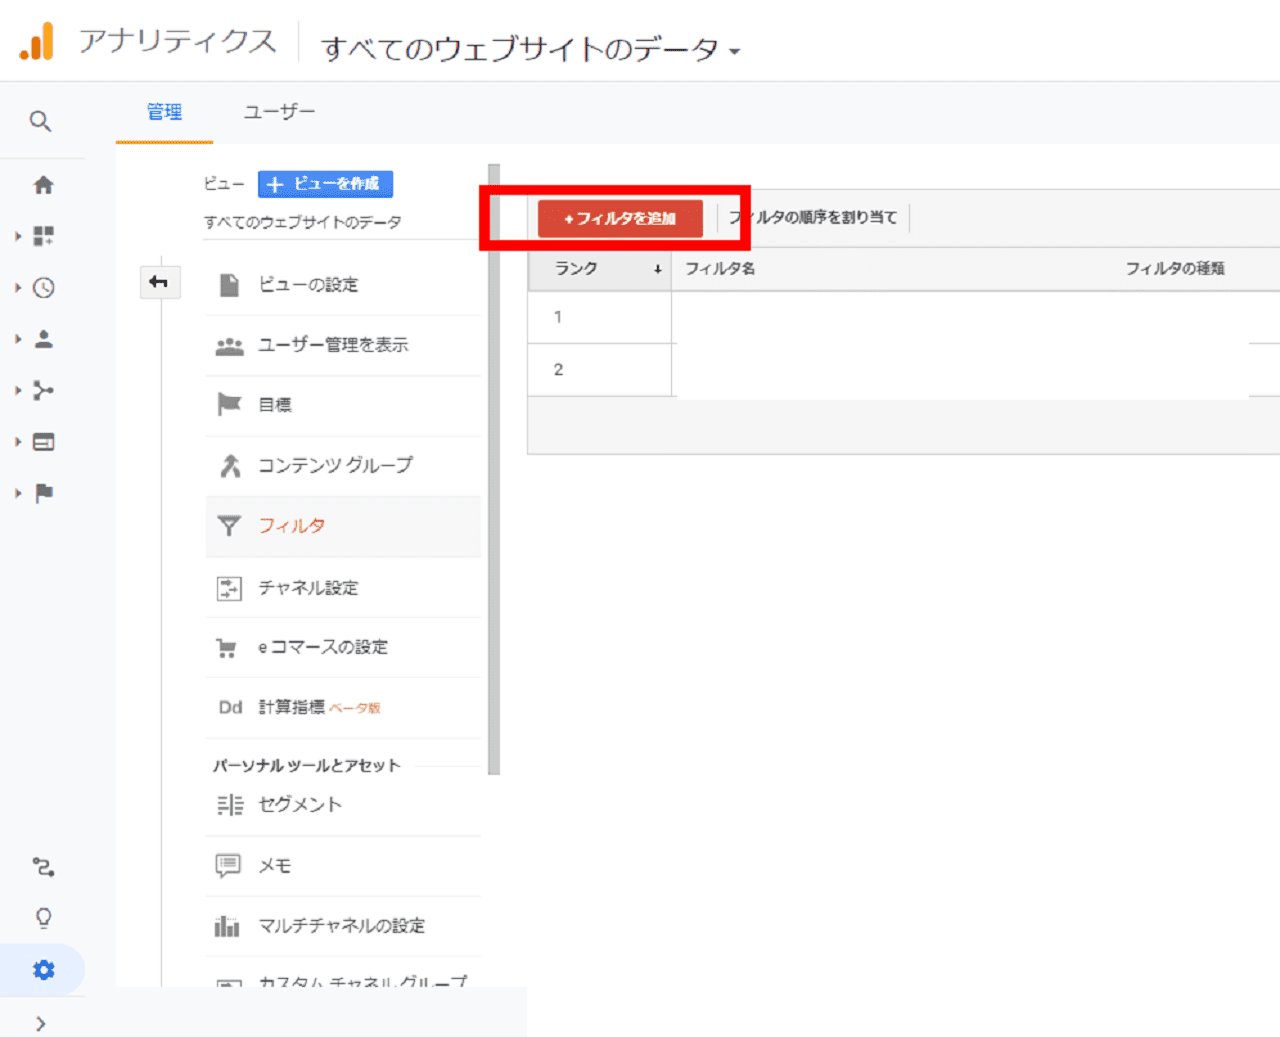 google-analytics-access-exclusion2-1